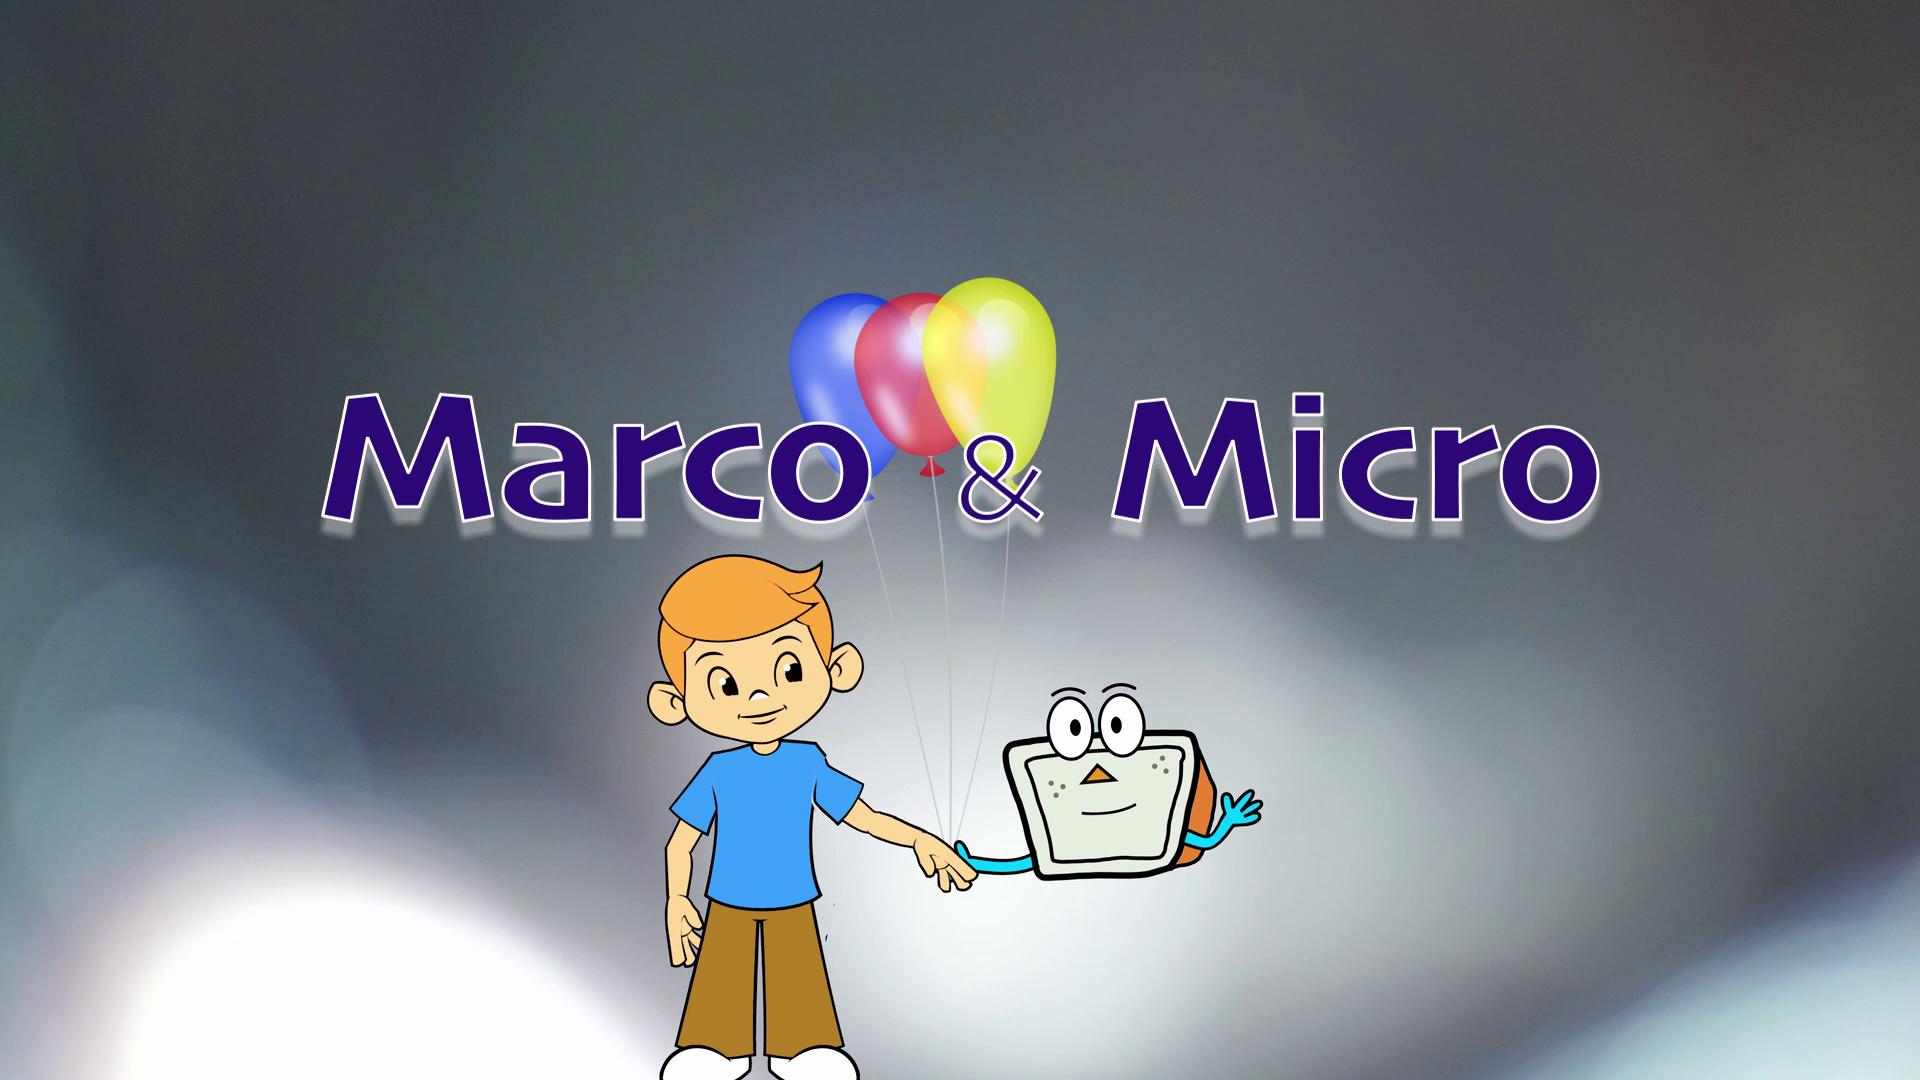 Marco e Micro